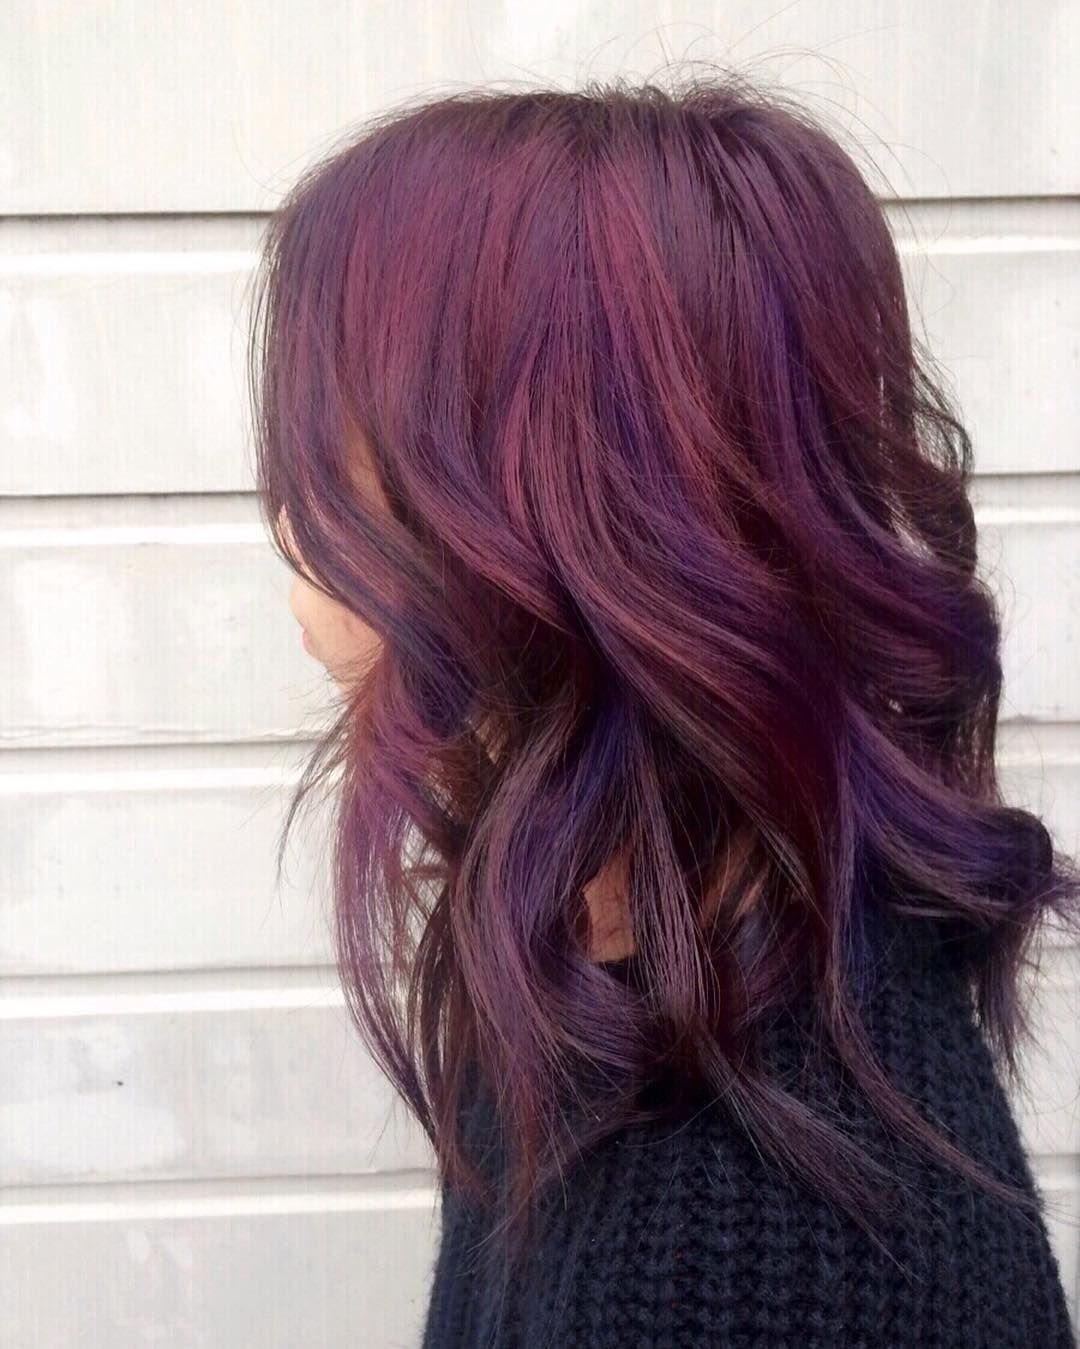 10 Amazing Dark Red Hair Color Ideas 50 striking dark red hair color ideas bright yet elegant colors 1 2021